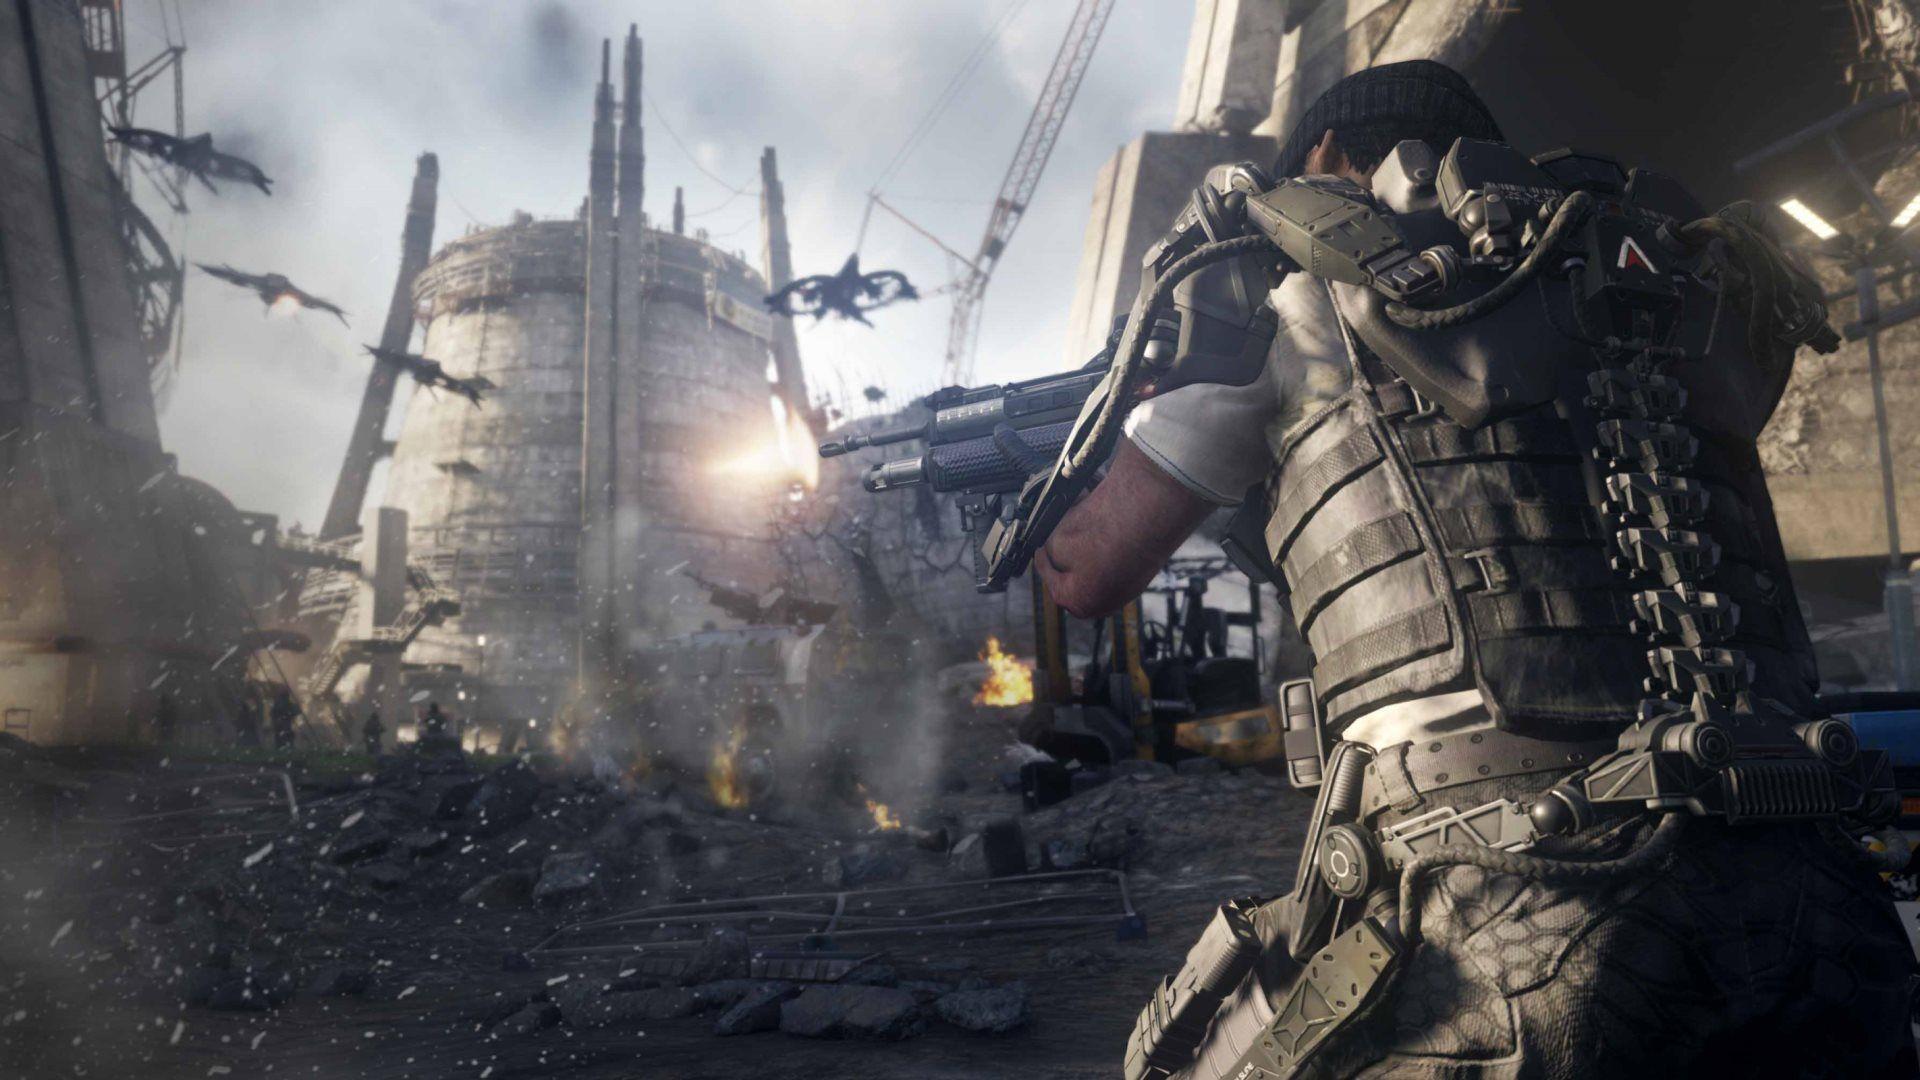 Download Call Of Duty Infinite Warfare Wallpaper 1920x1080